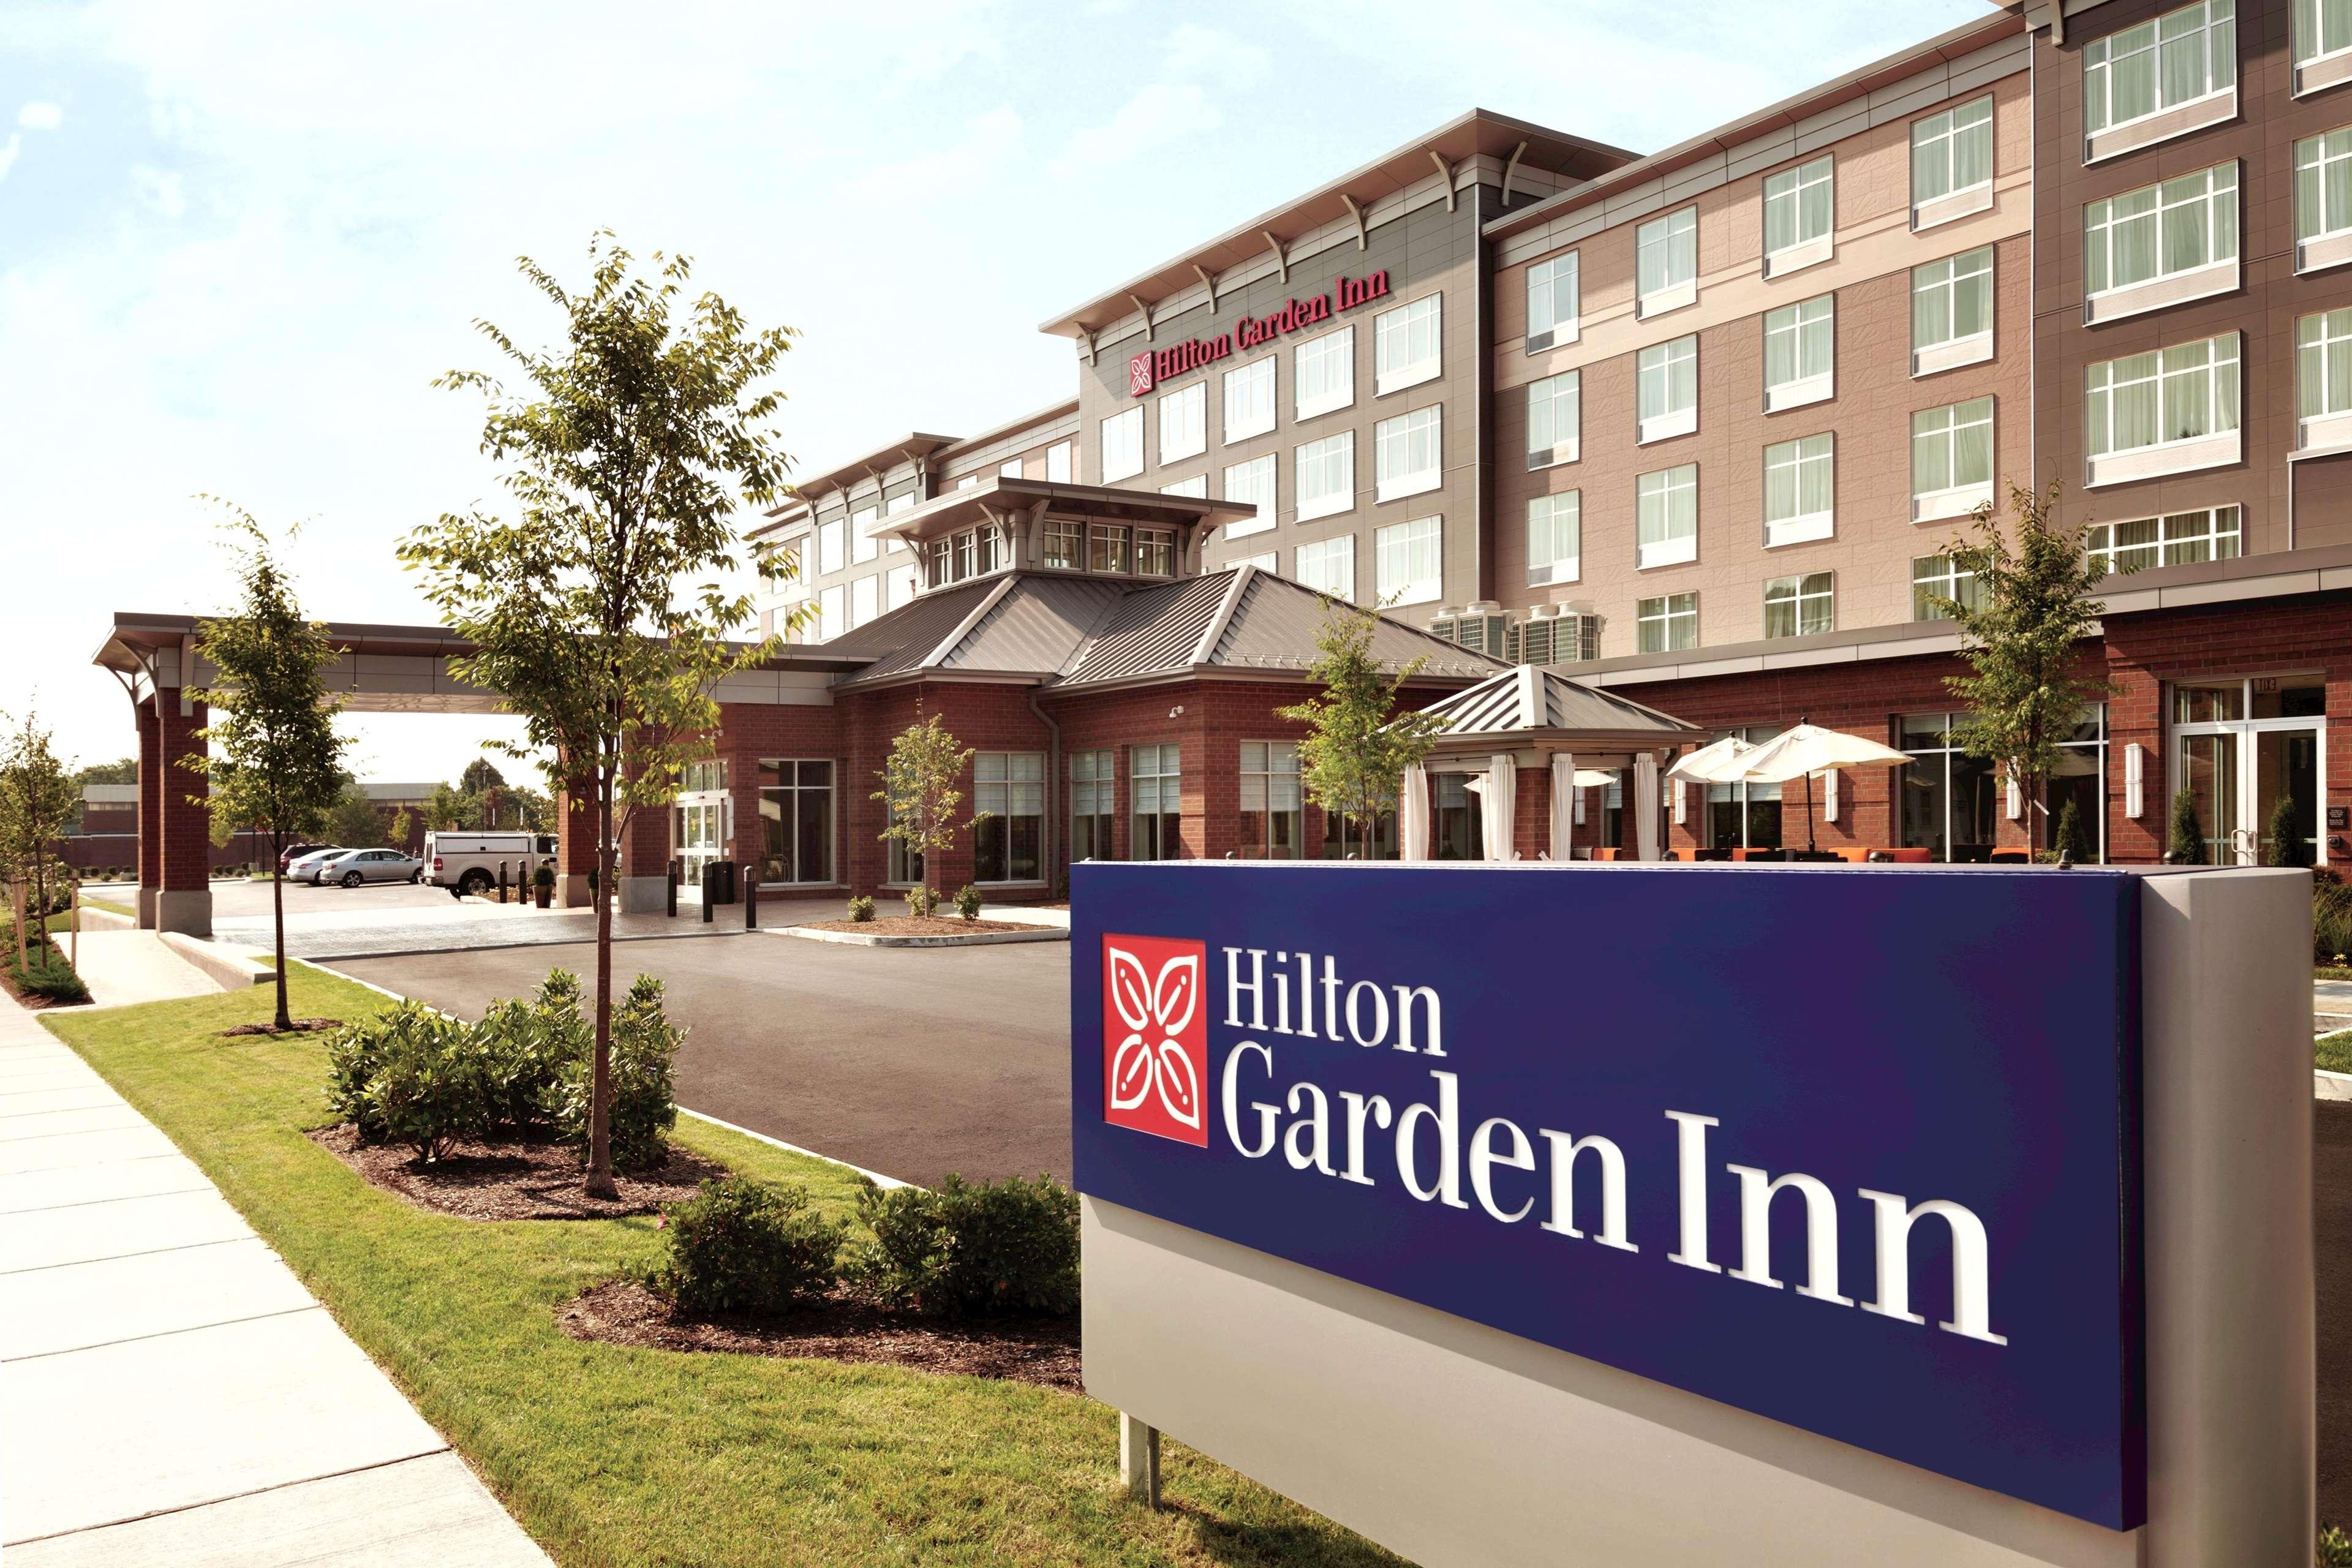 Hilton Garden Inn Boston Logan Airport 100 Boardman Street Boston Ma